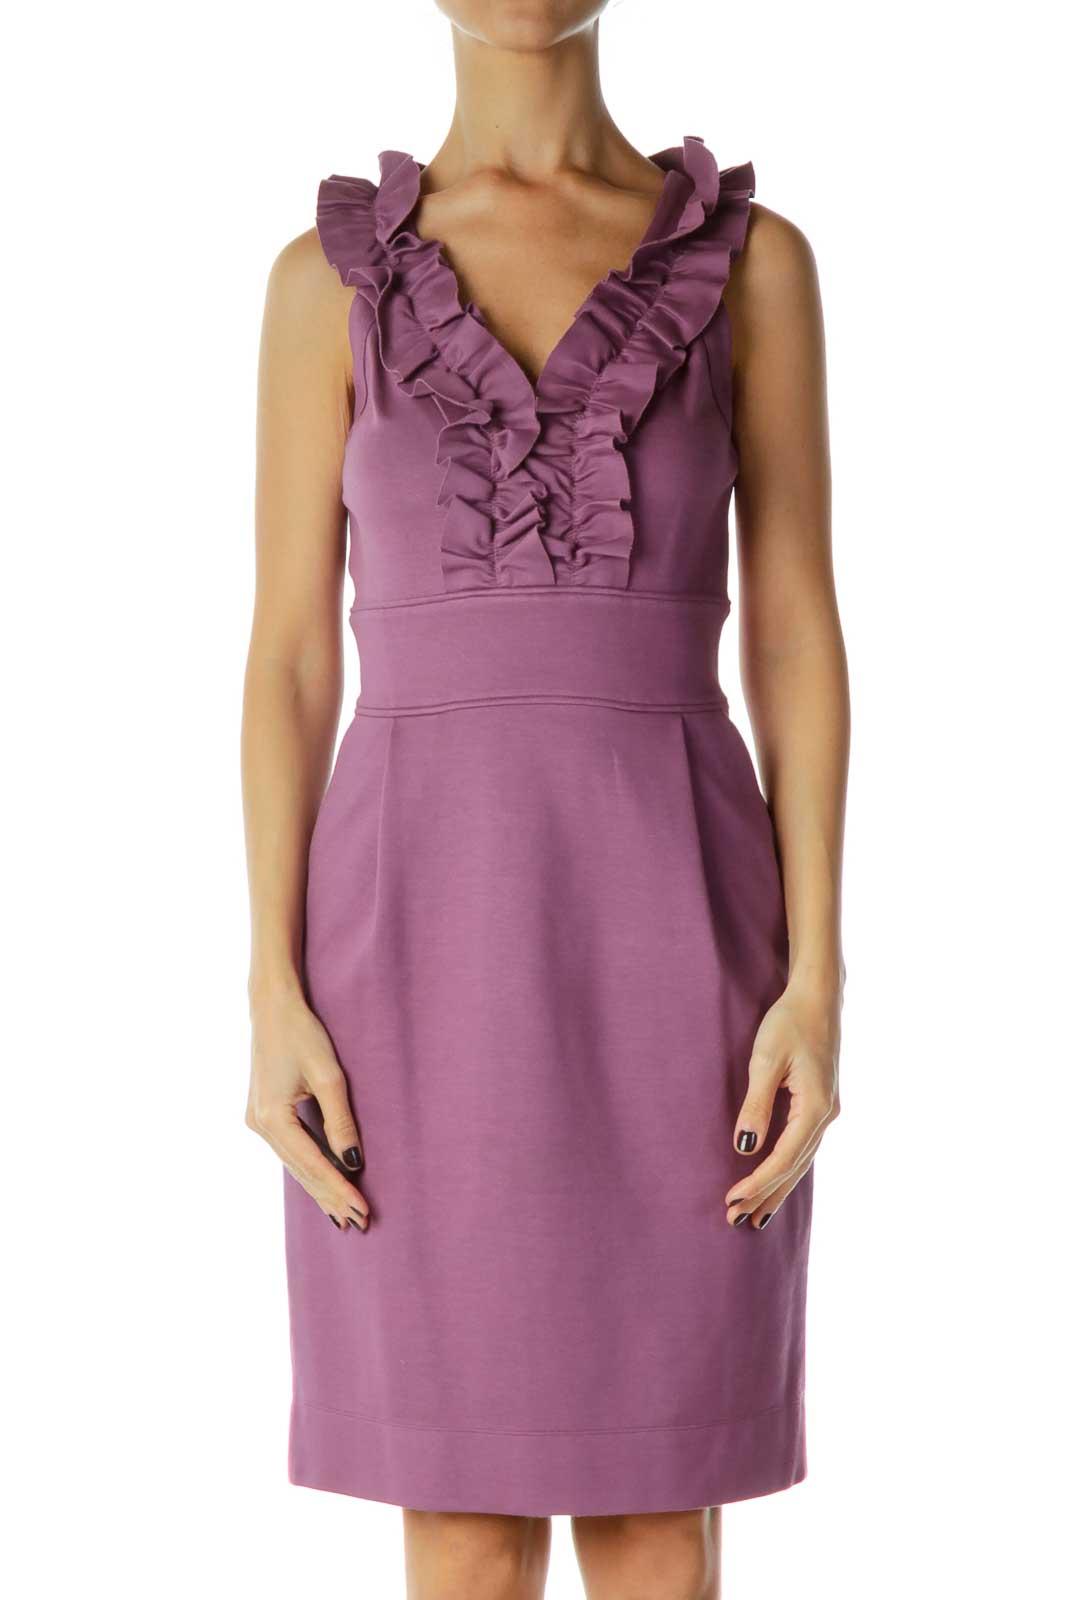 Purple Ruffled Work Dress Front